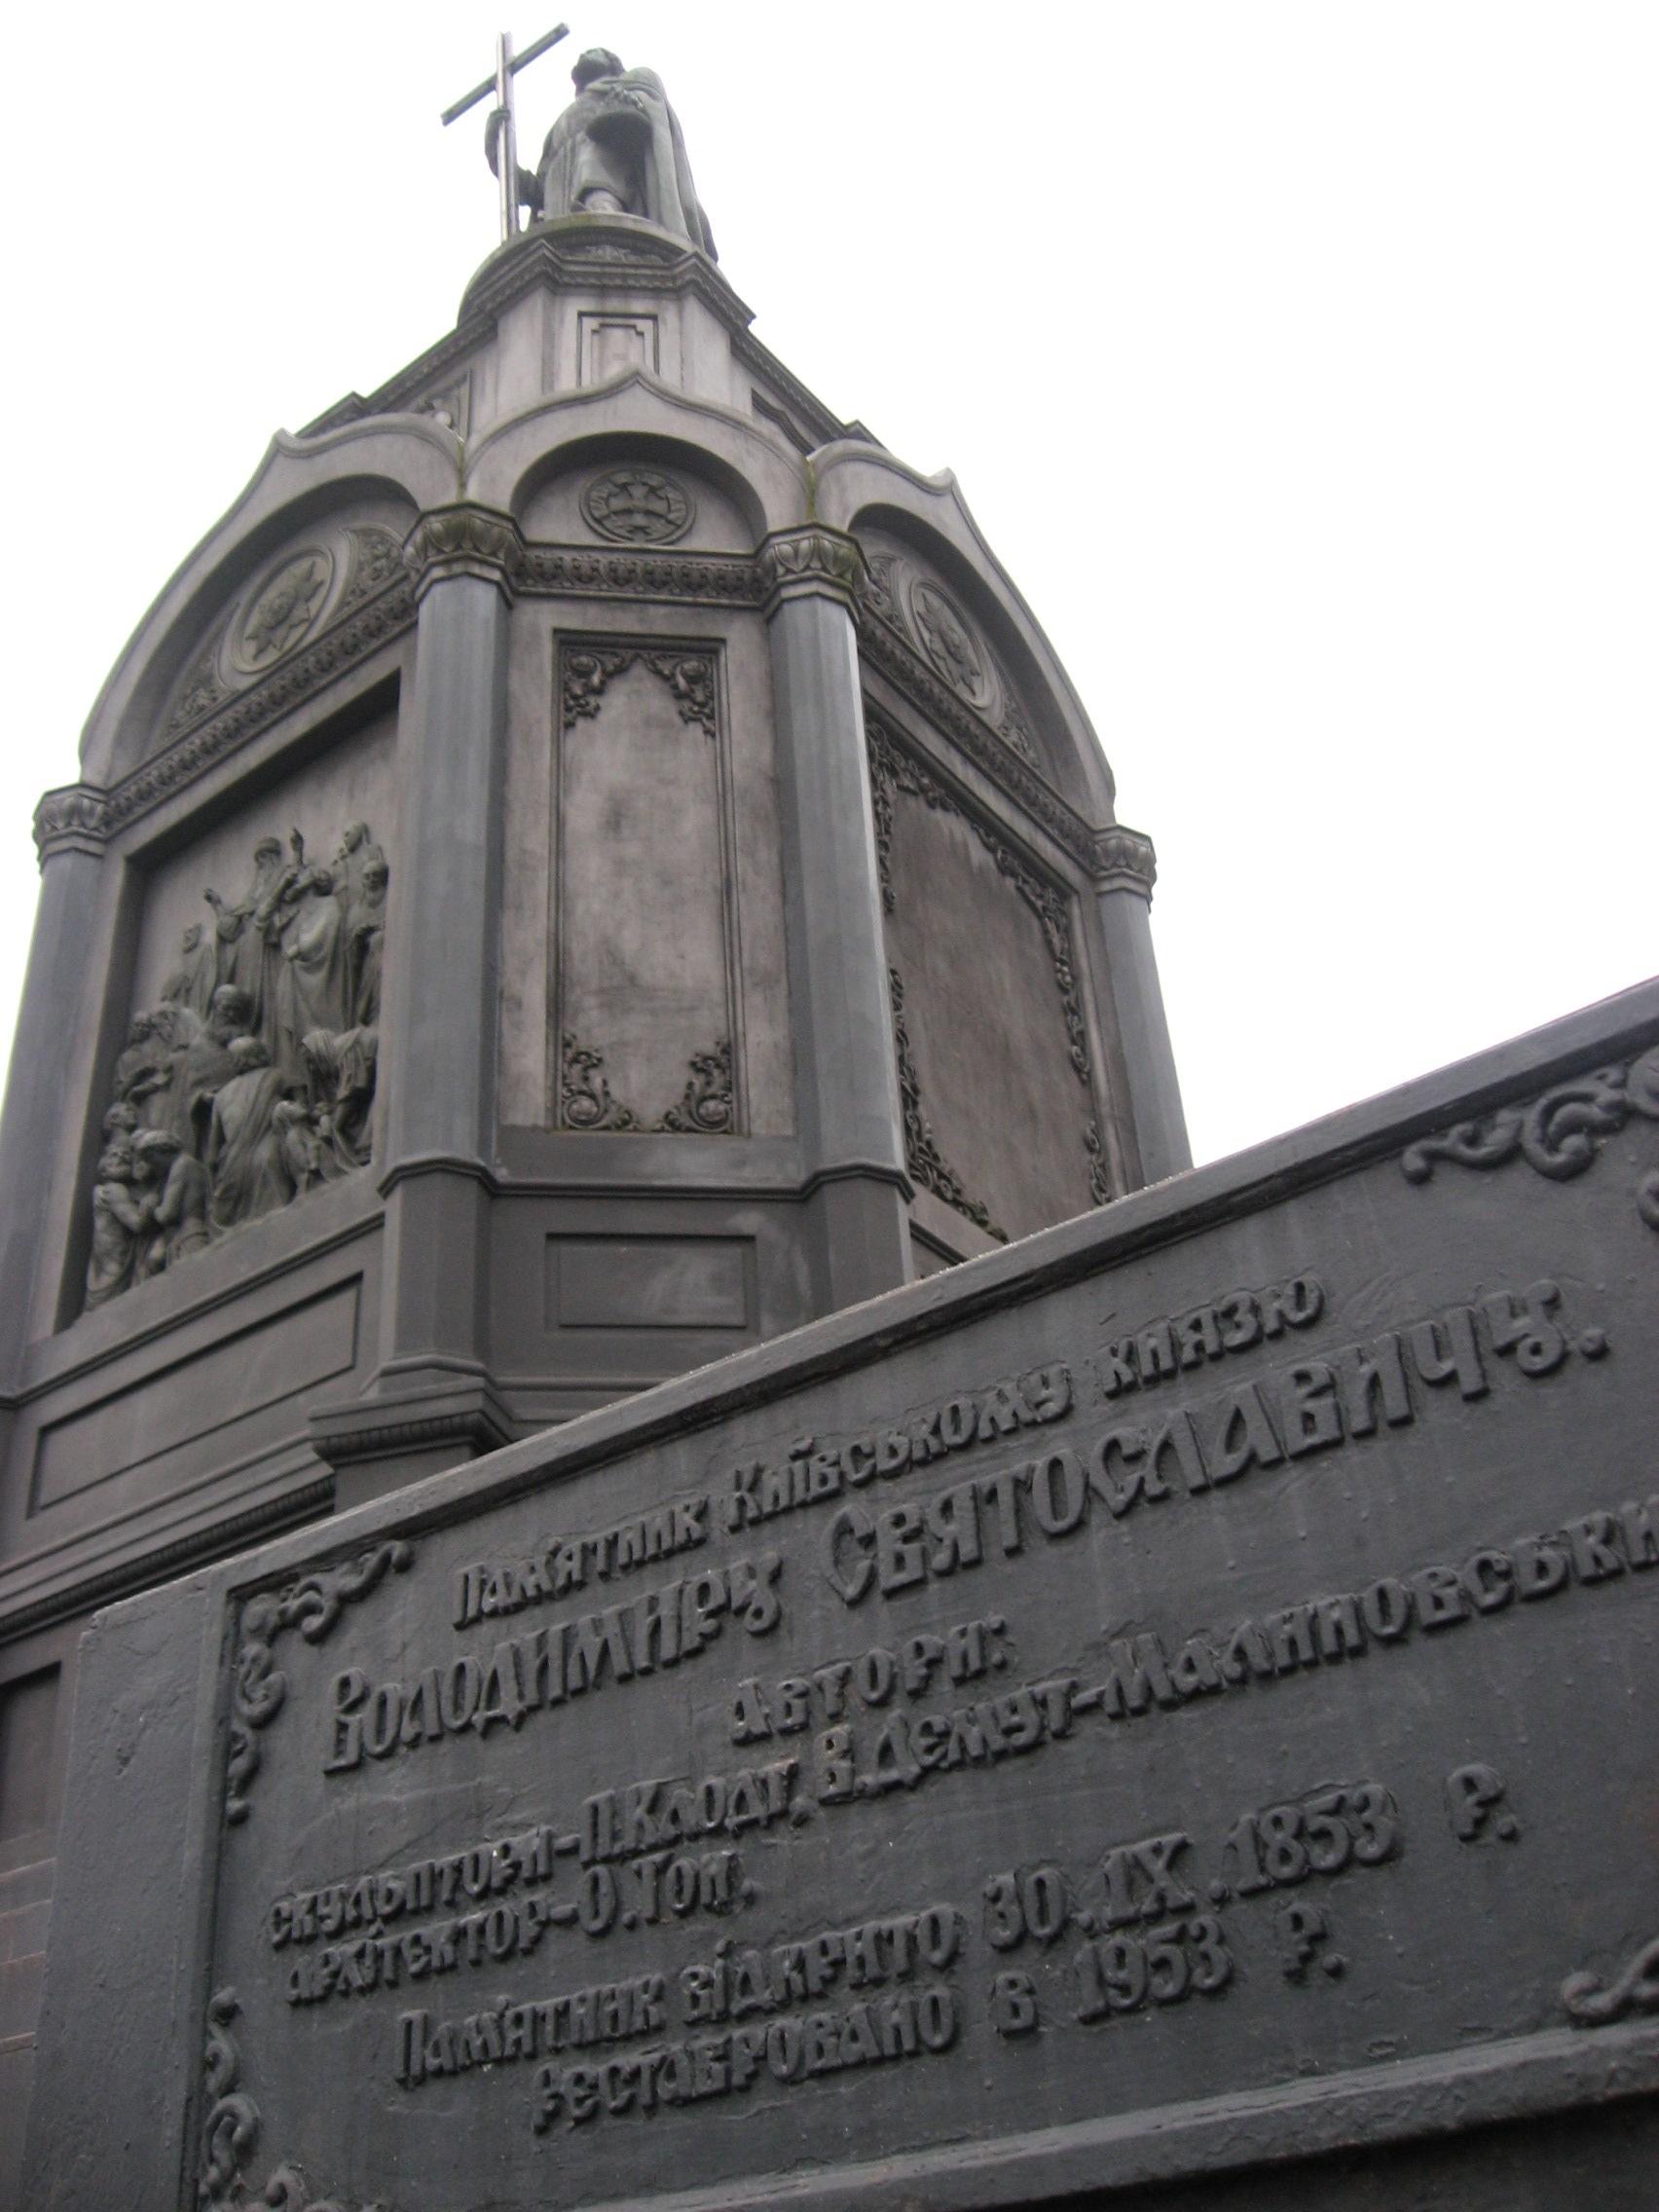 https://upload.wikimedia.org/wikipedia/commons/0/01/Kyiv_-_Volodymyr_memo.jpg